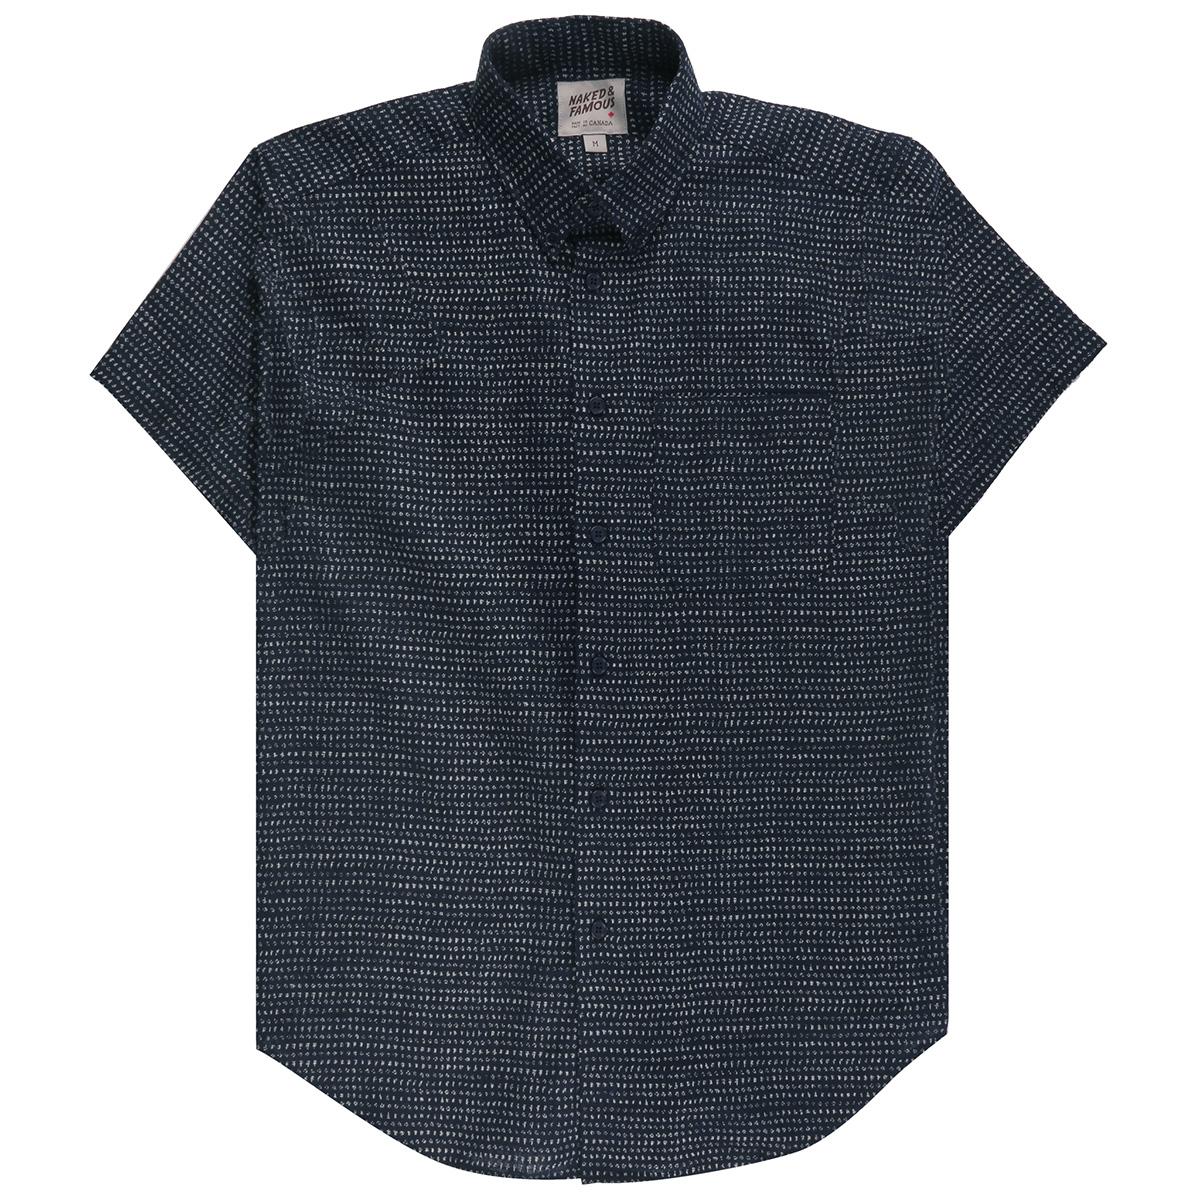 KIMONO CHON - Short Sleeve Easy Shirt